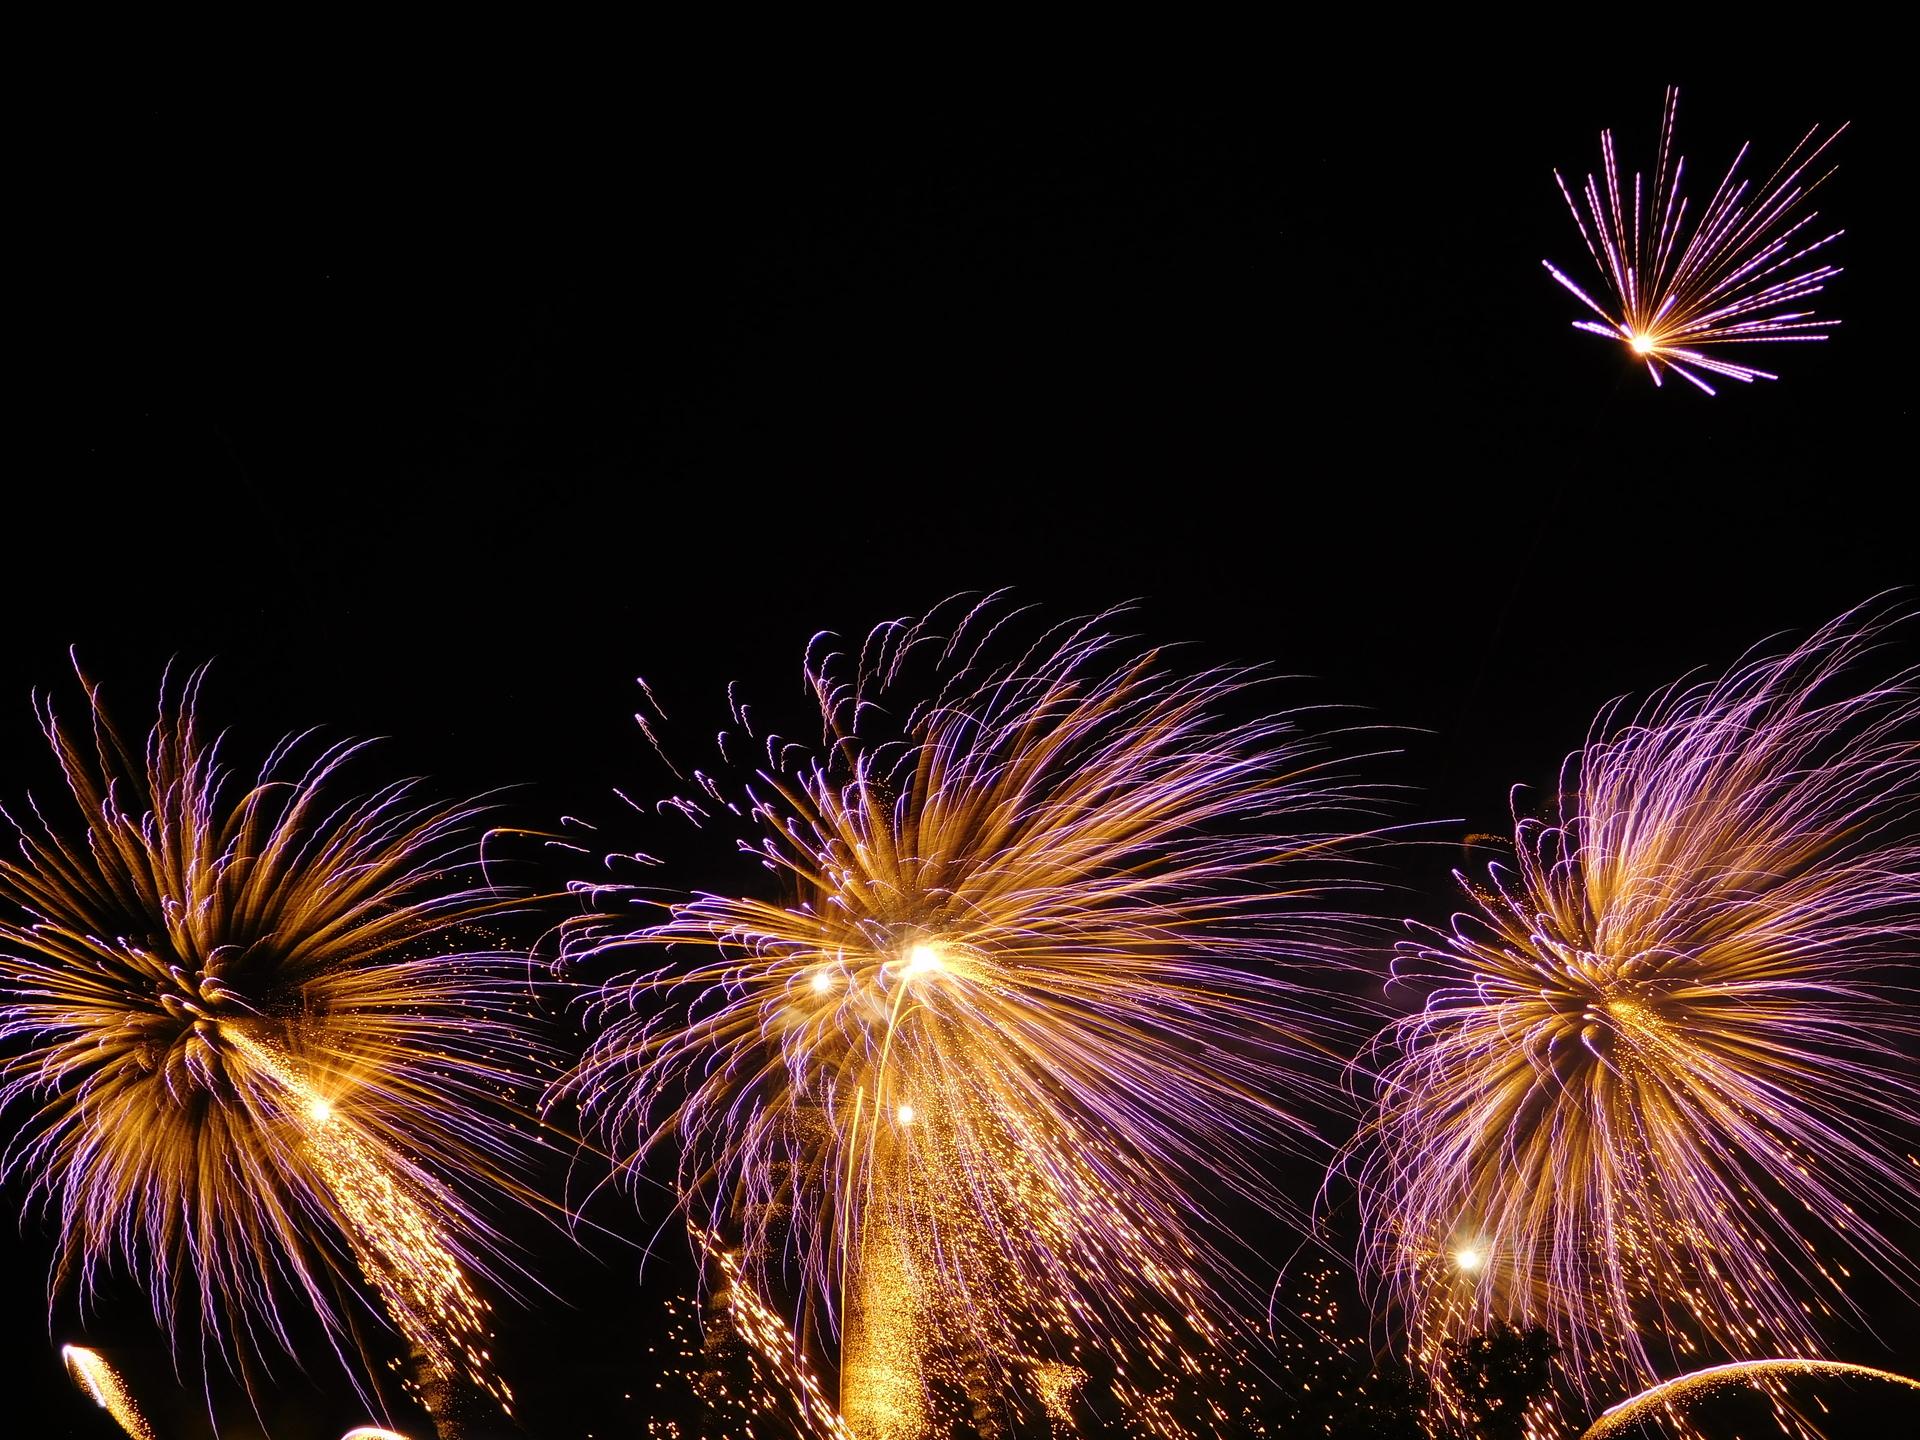 Fireworks | rick.cognyl.fournier, bang, bright, celebration